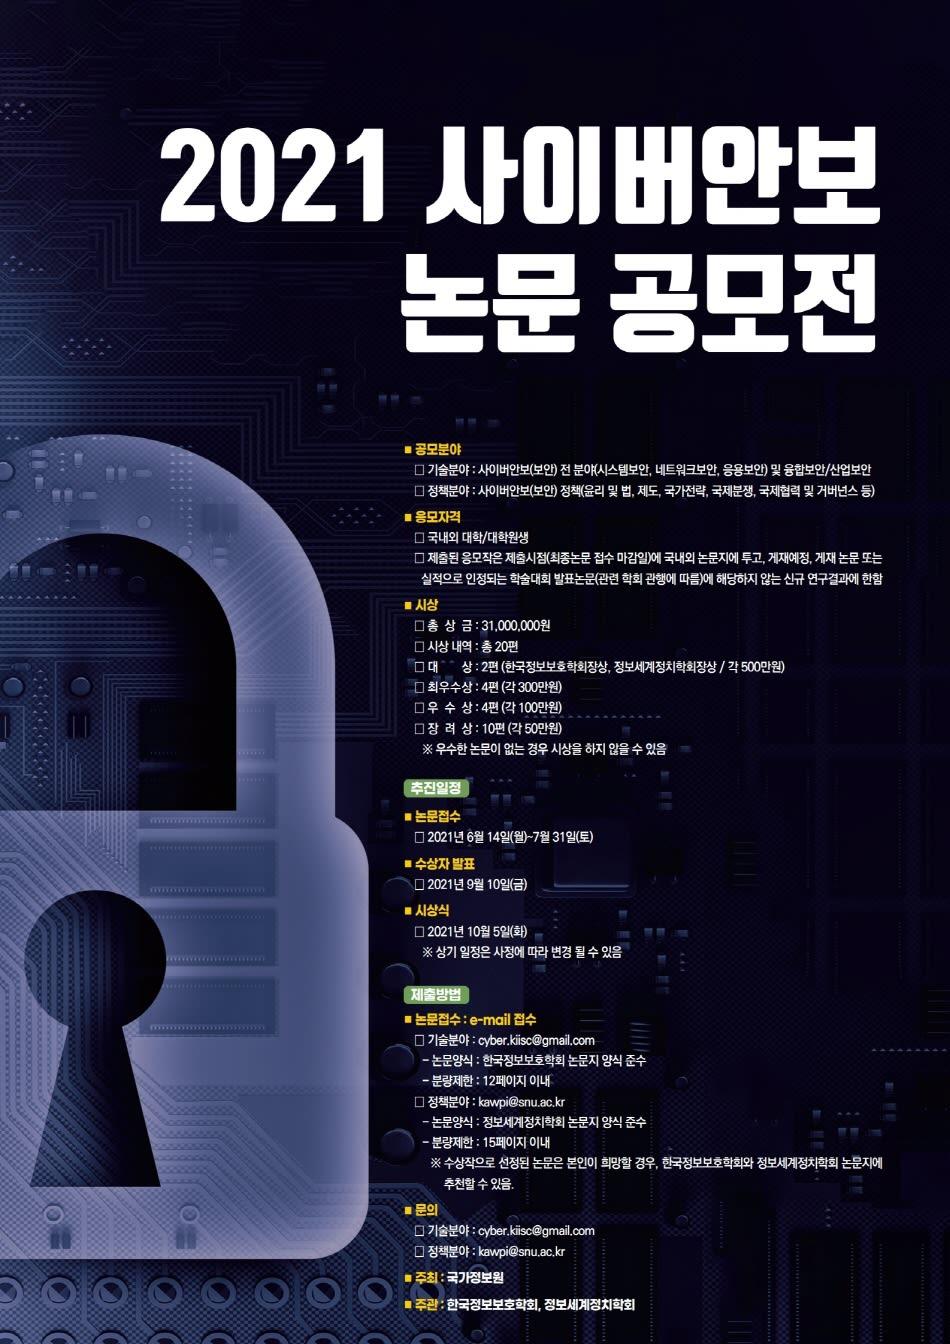 KIISC 2021 사이버안보 논문 공모전